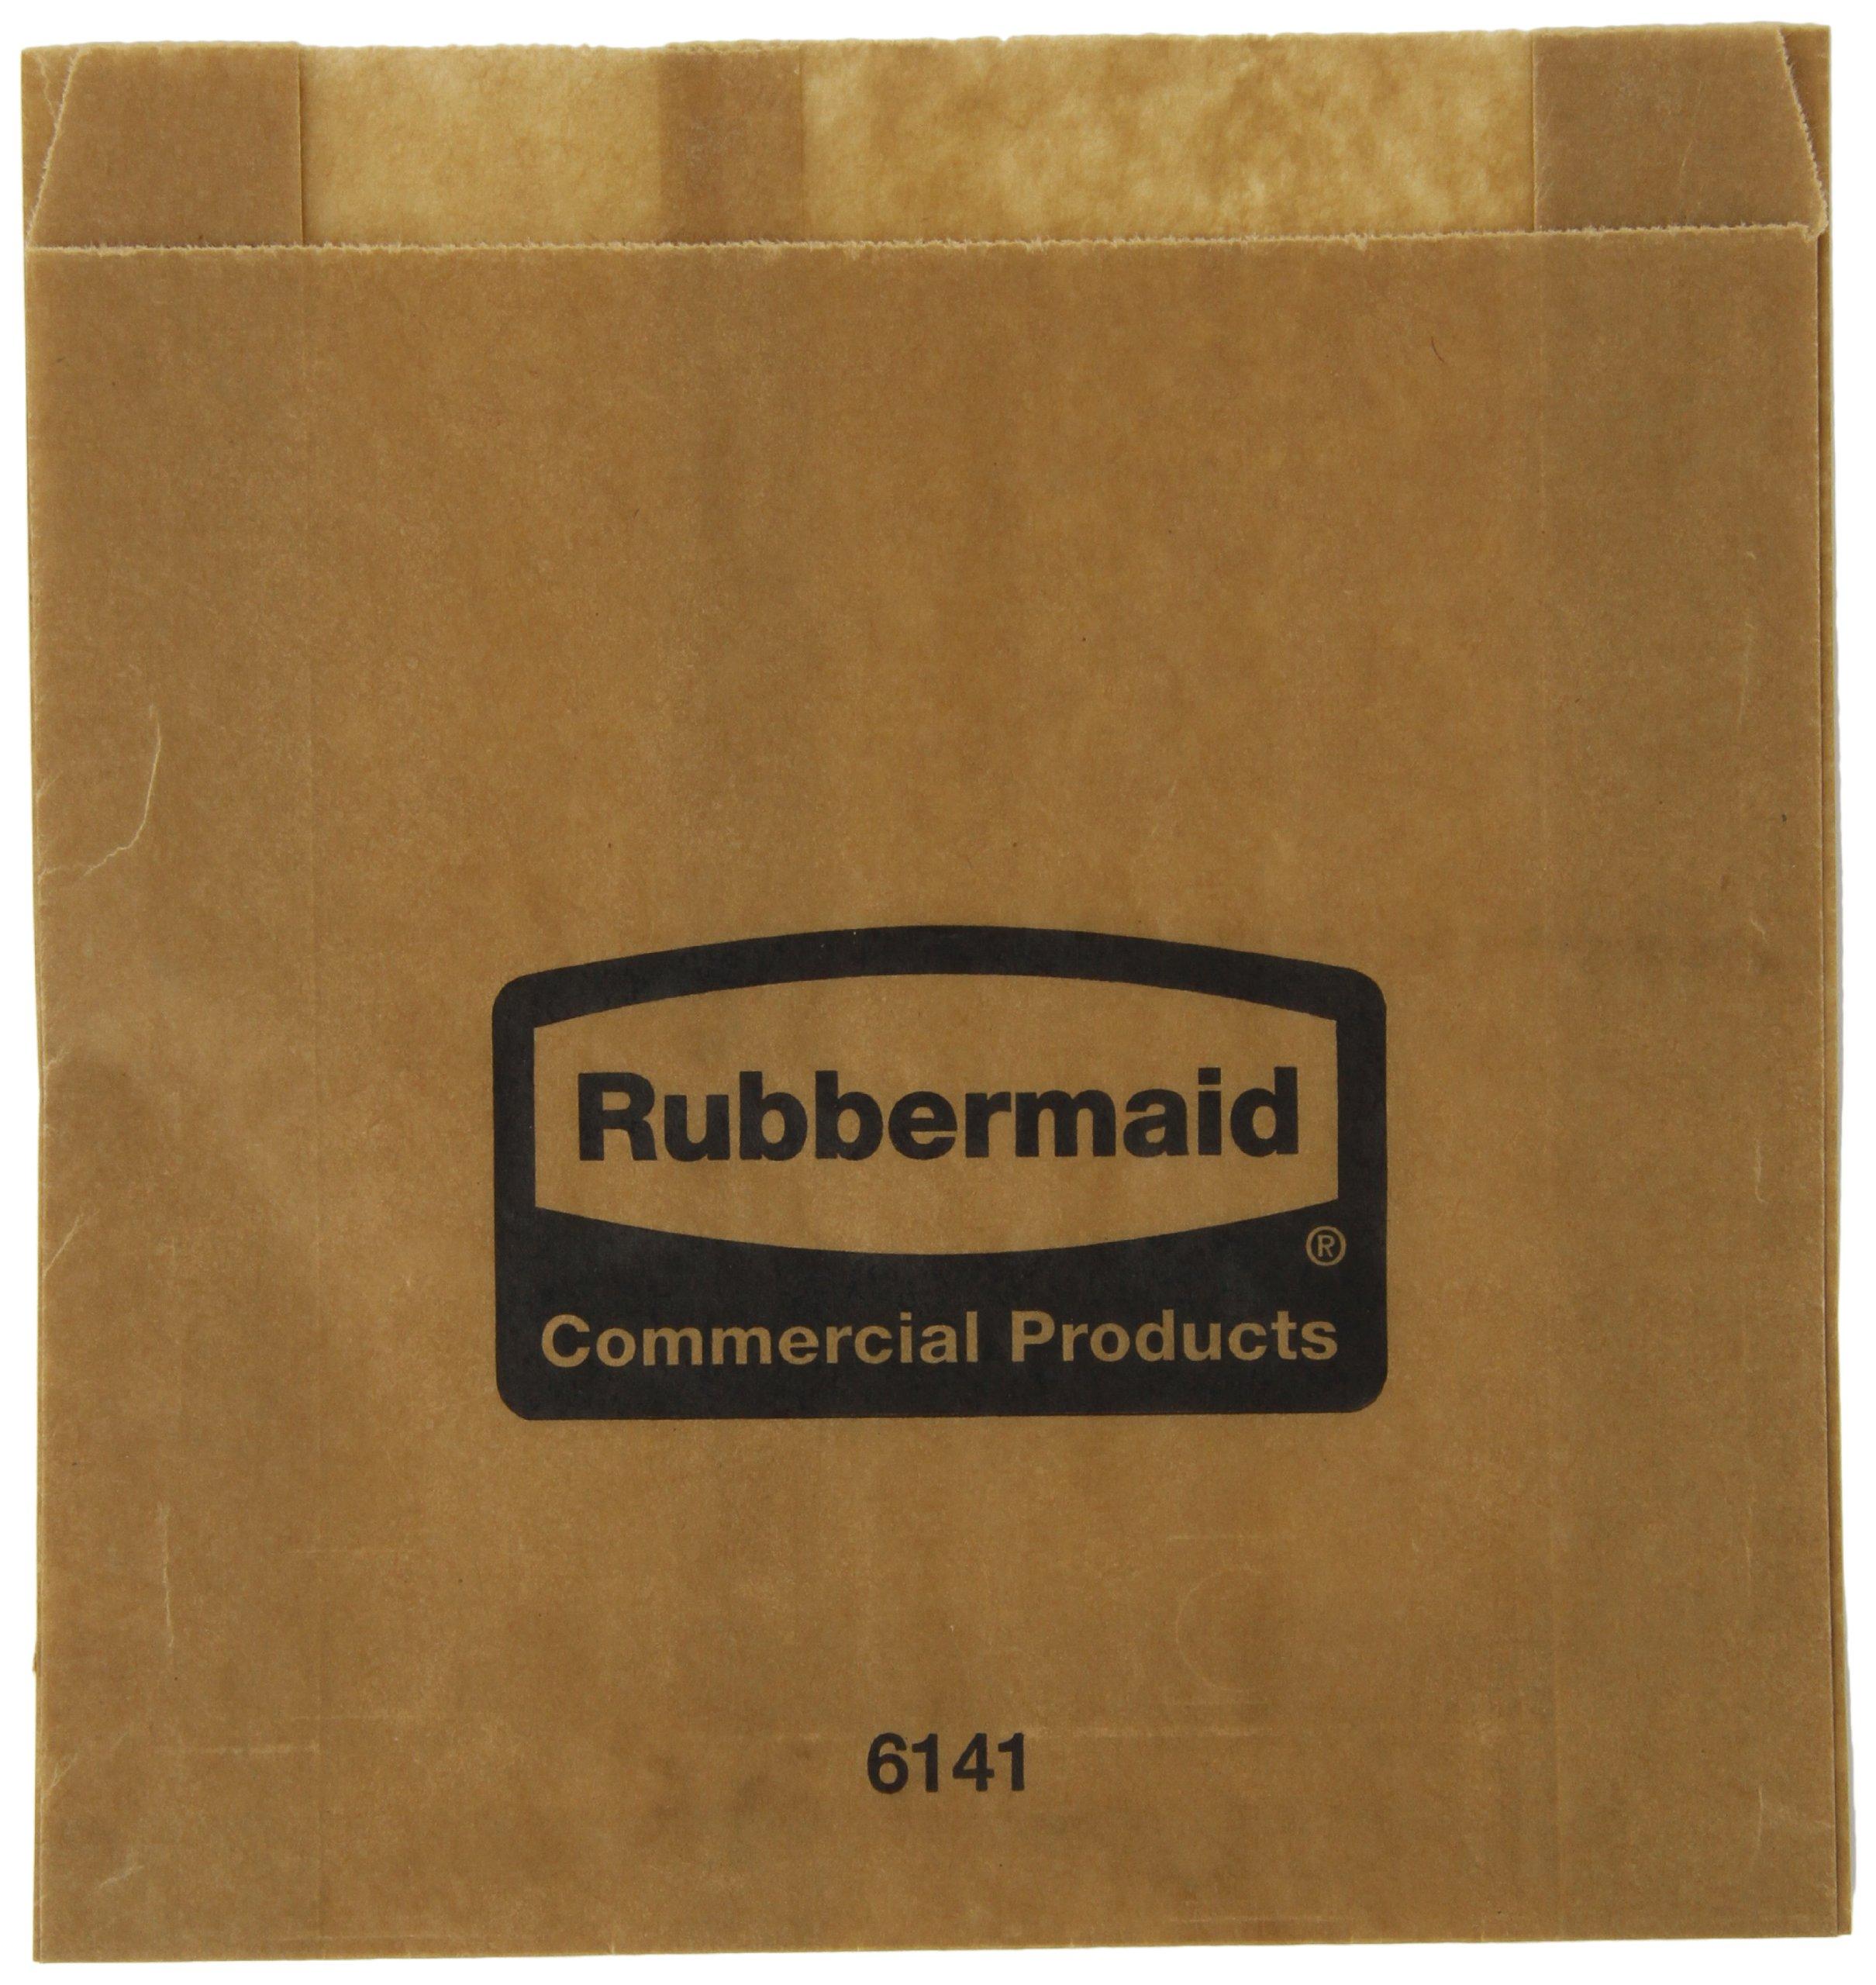 Rubbermaid Commercial Waxed Sanitary Napkin Bags, Pack of 250 (FG6141000000) by Rubbermaid Commercial Products